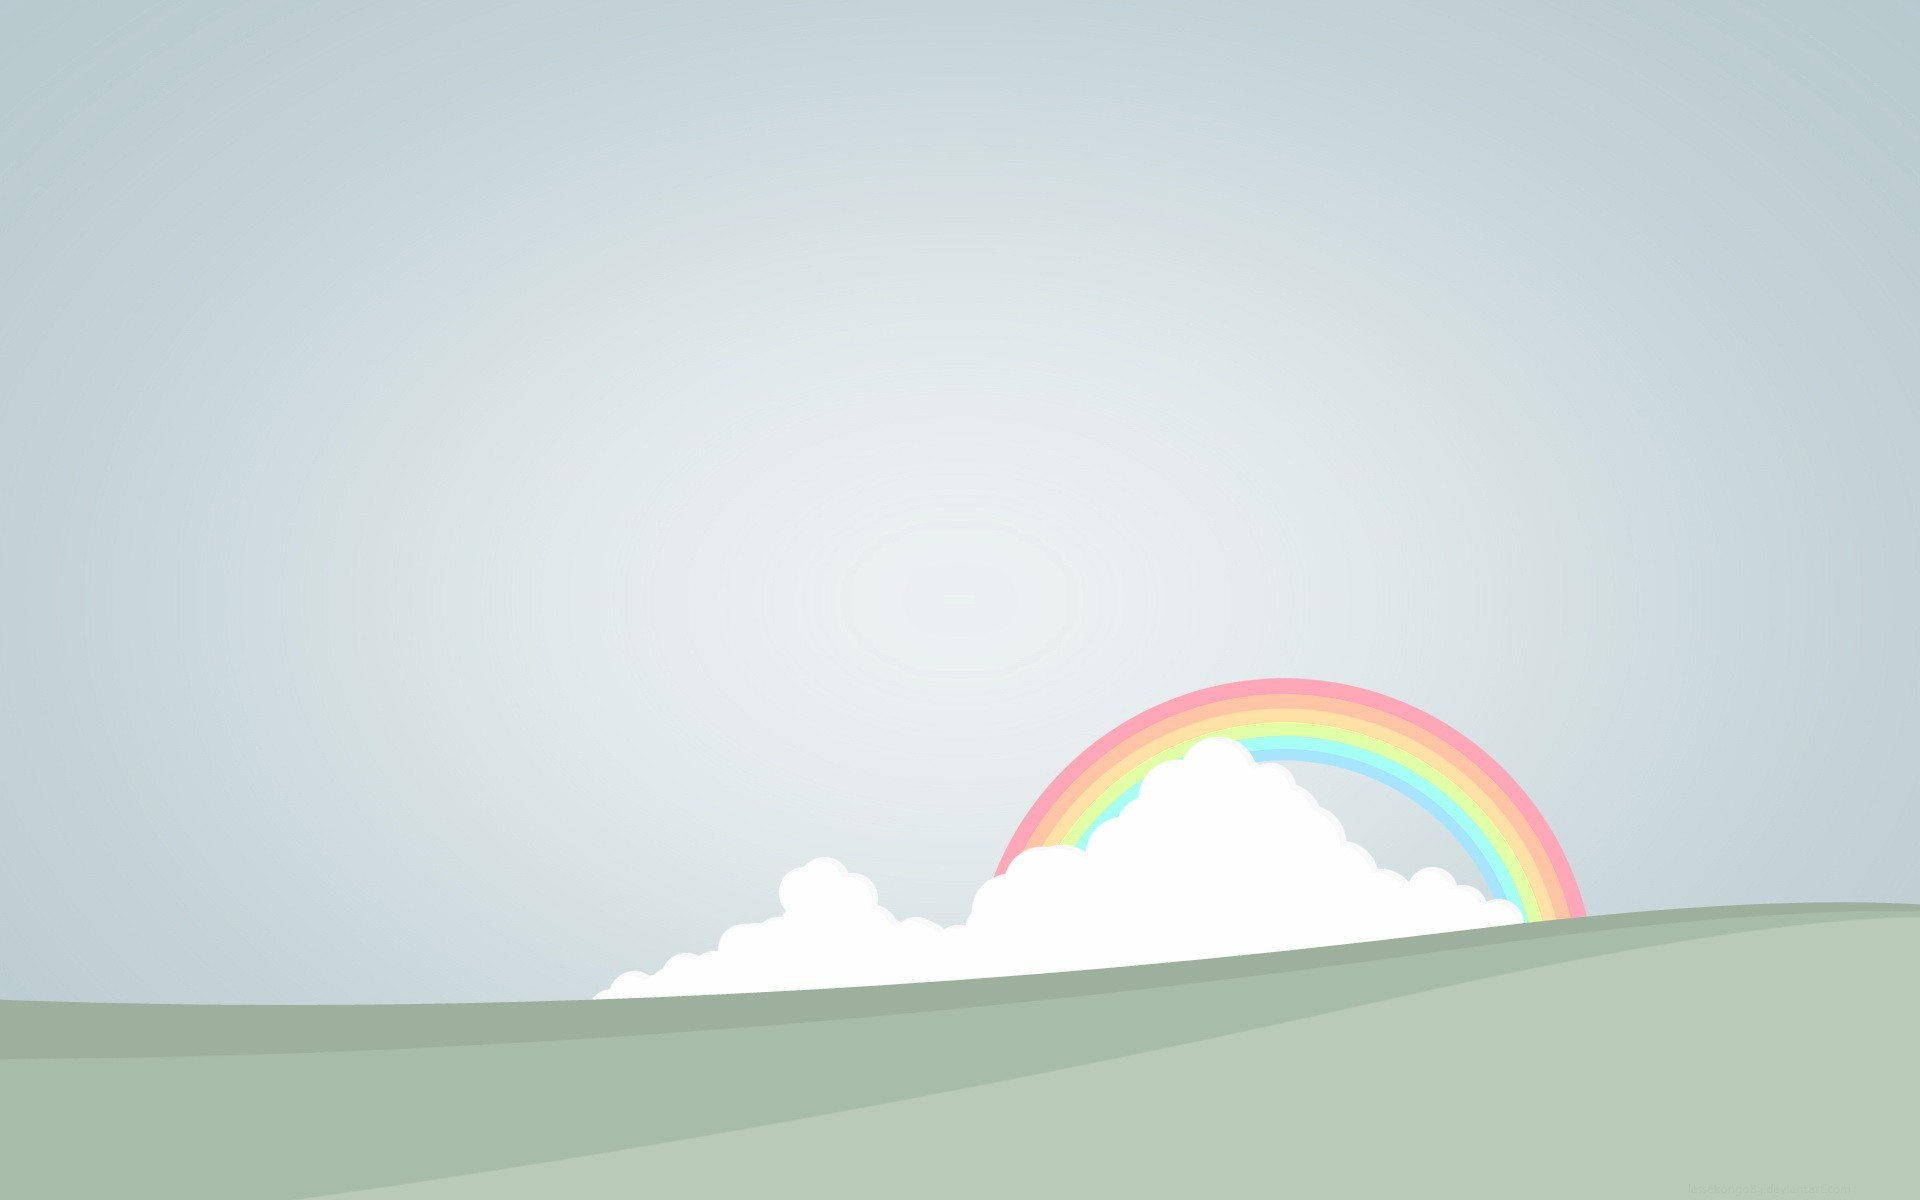 Облака вектор без смс